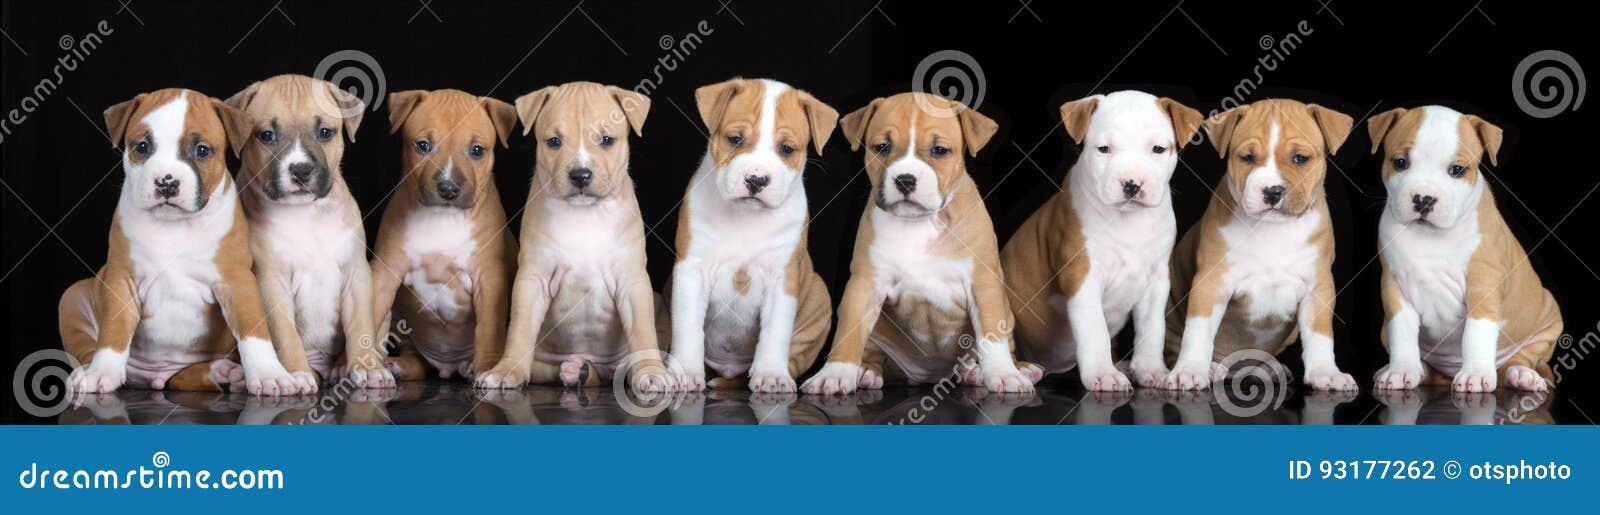 Группа в составе щенята терьера Стаффордшира представляя на черноте